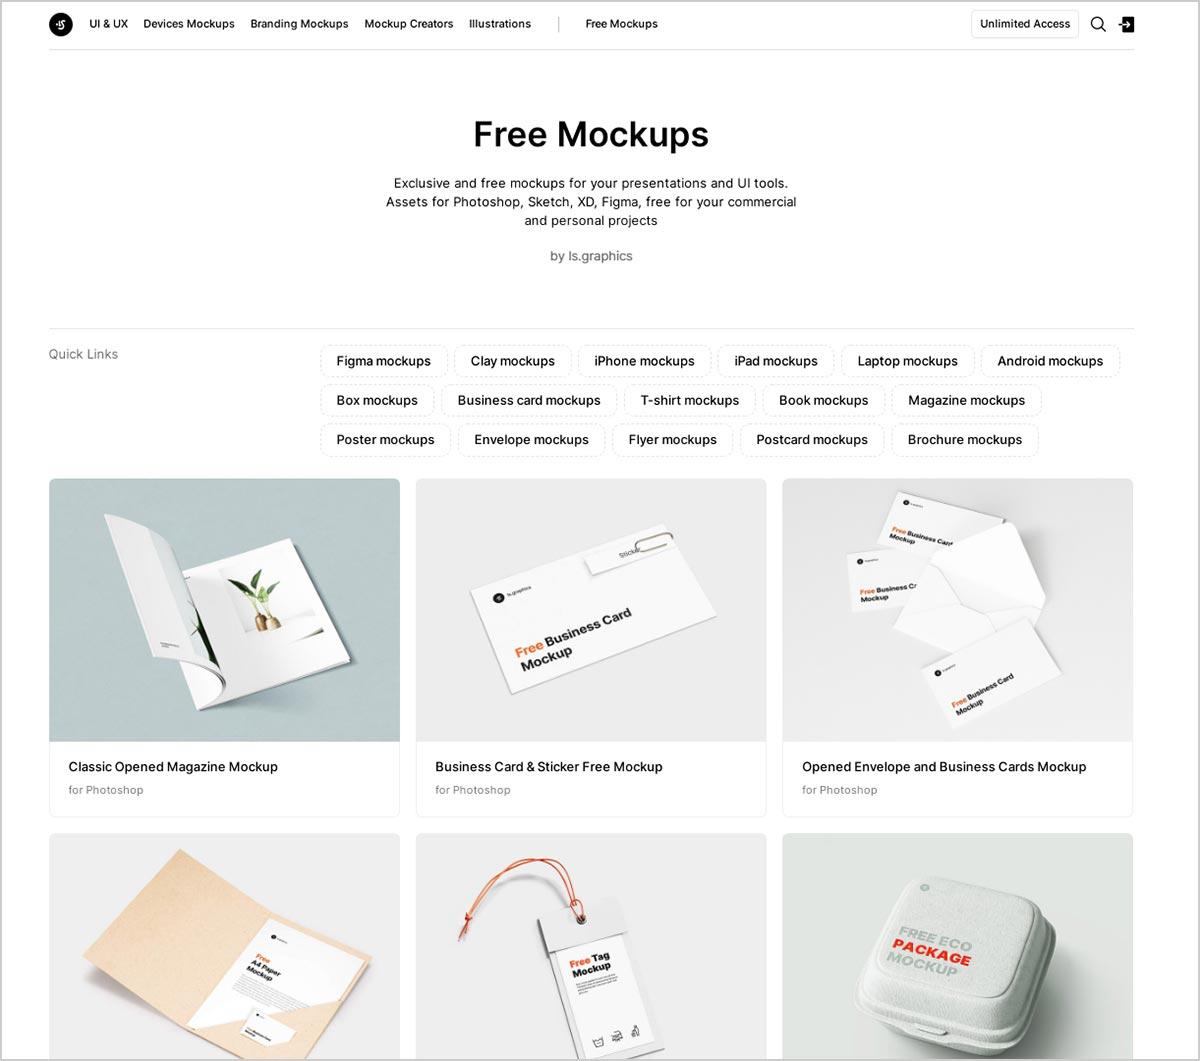 ls-graphics-free-mockup-website-2021